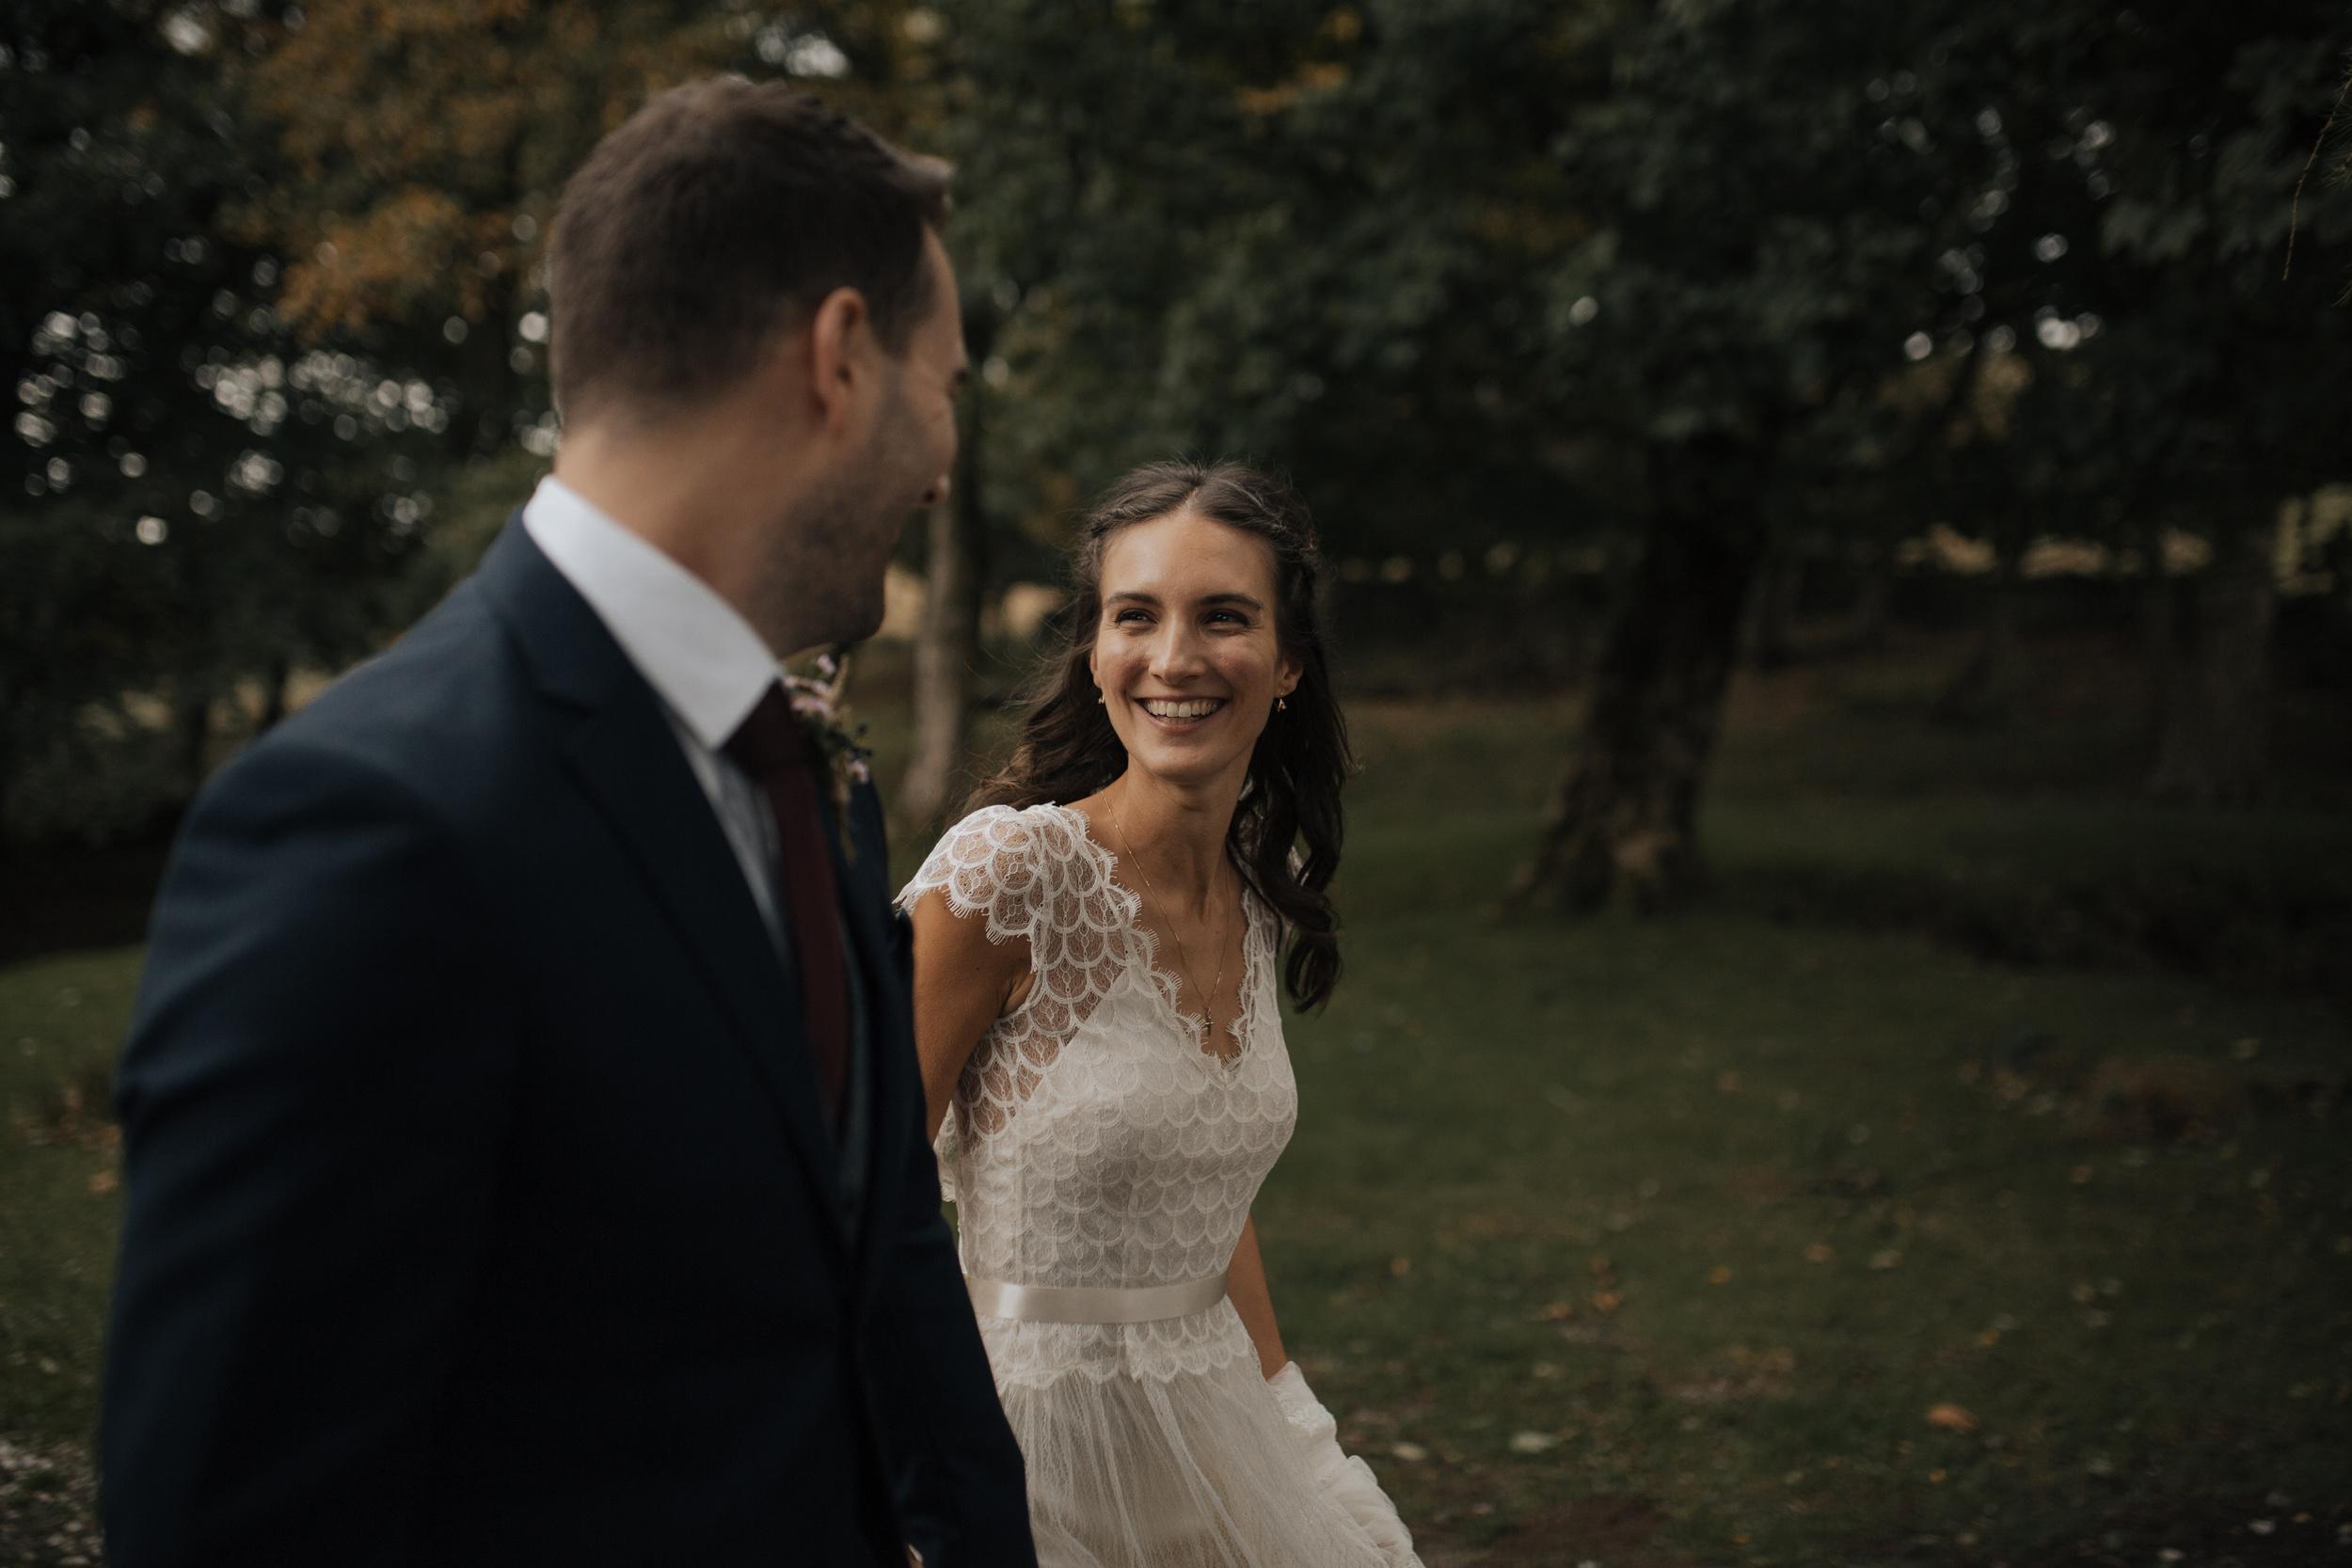 Joasia-Kate-Beaumont-Bohemian-Lace-Wedding-Dress-Peak-District-Sheffield-Wedding-21.jpg